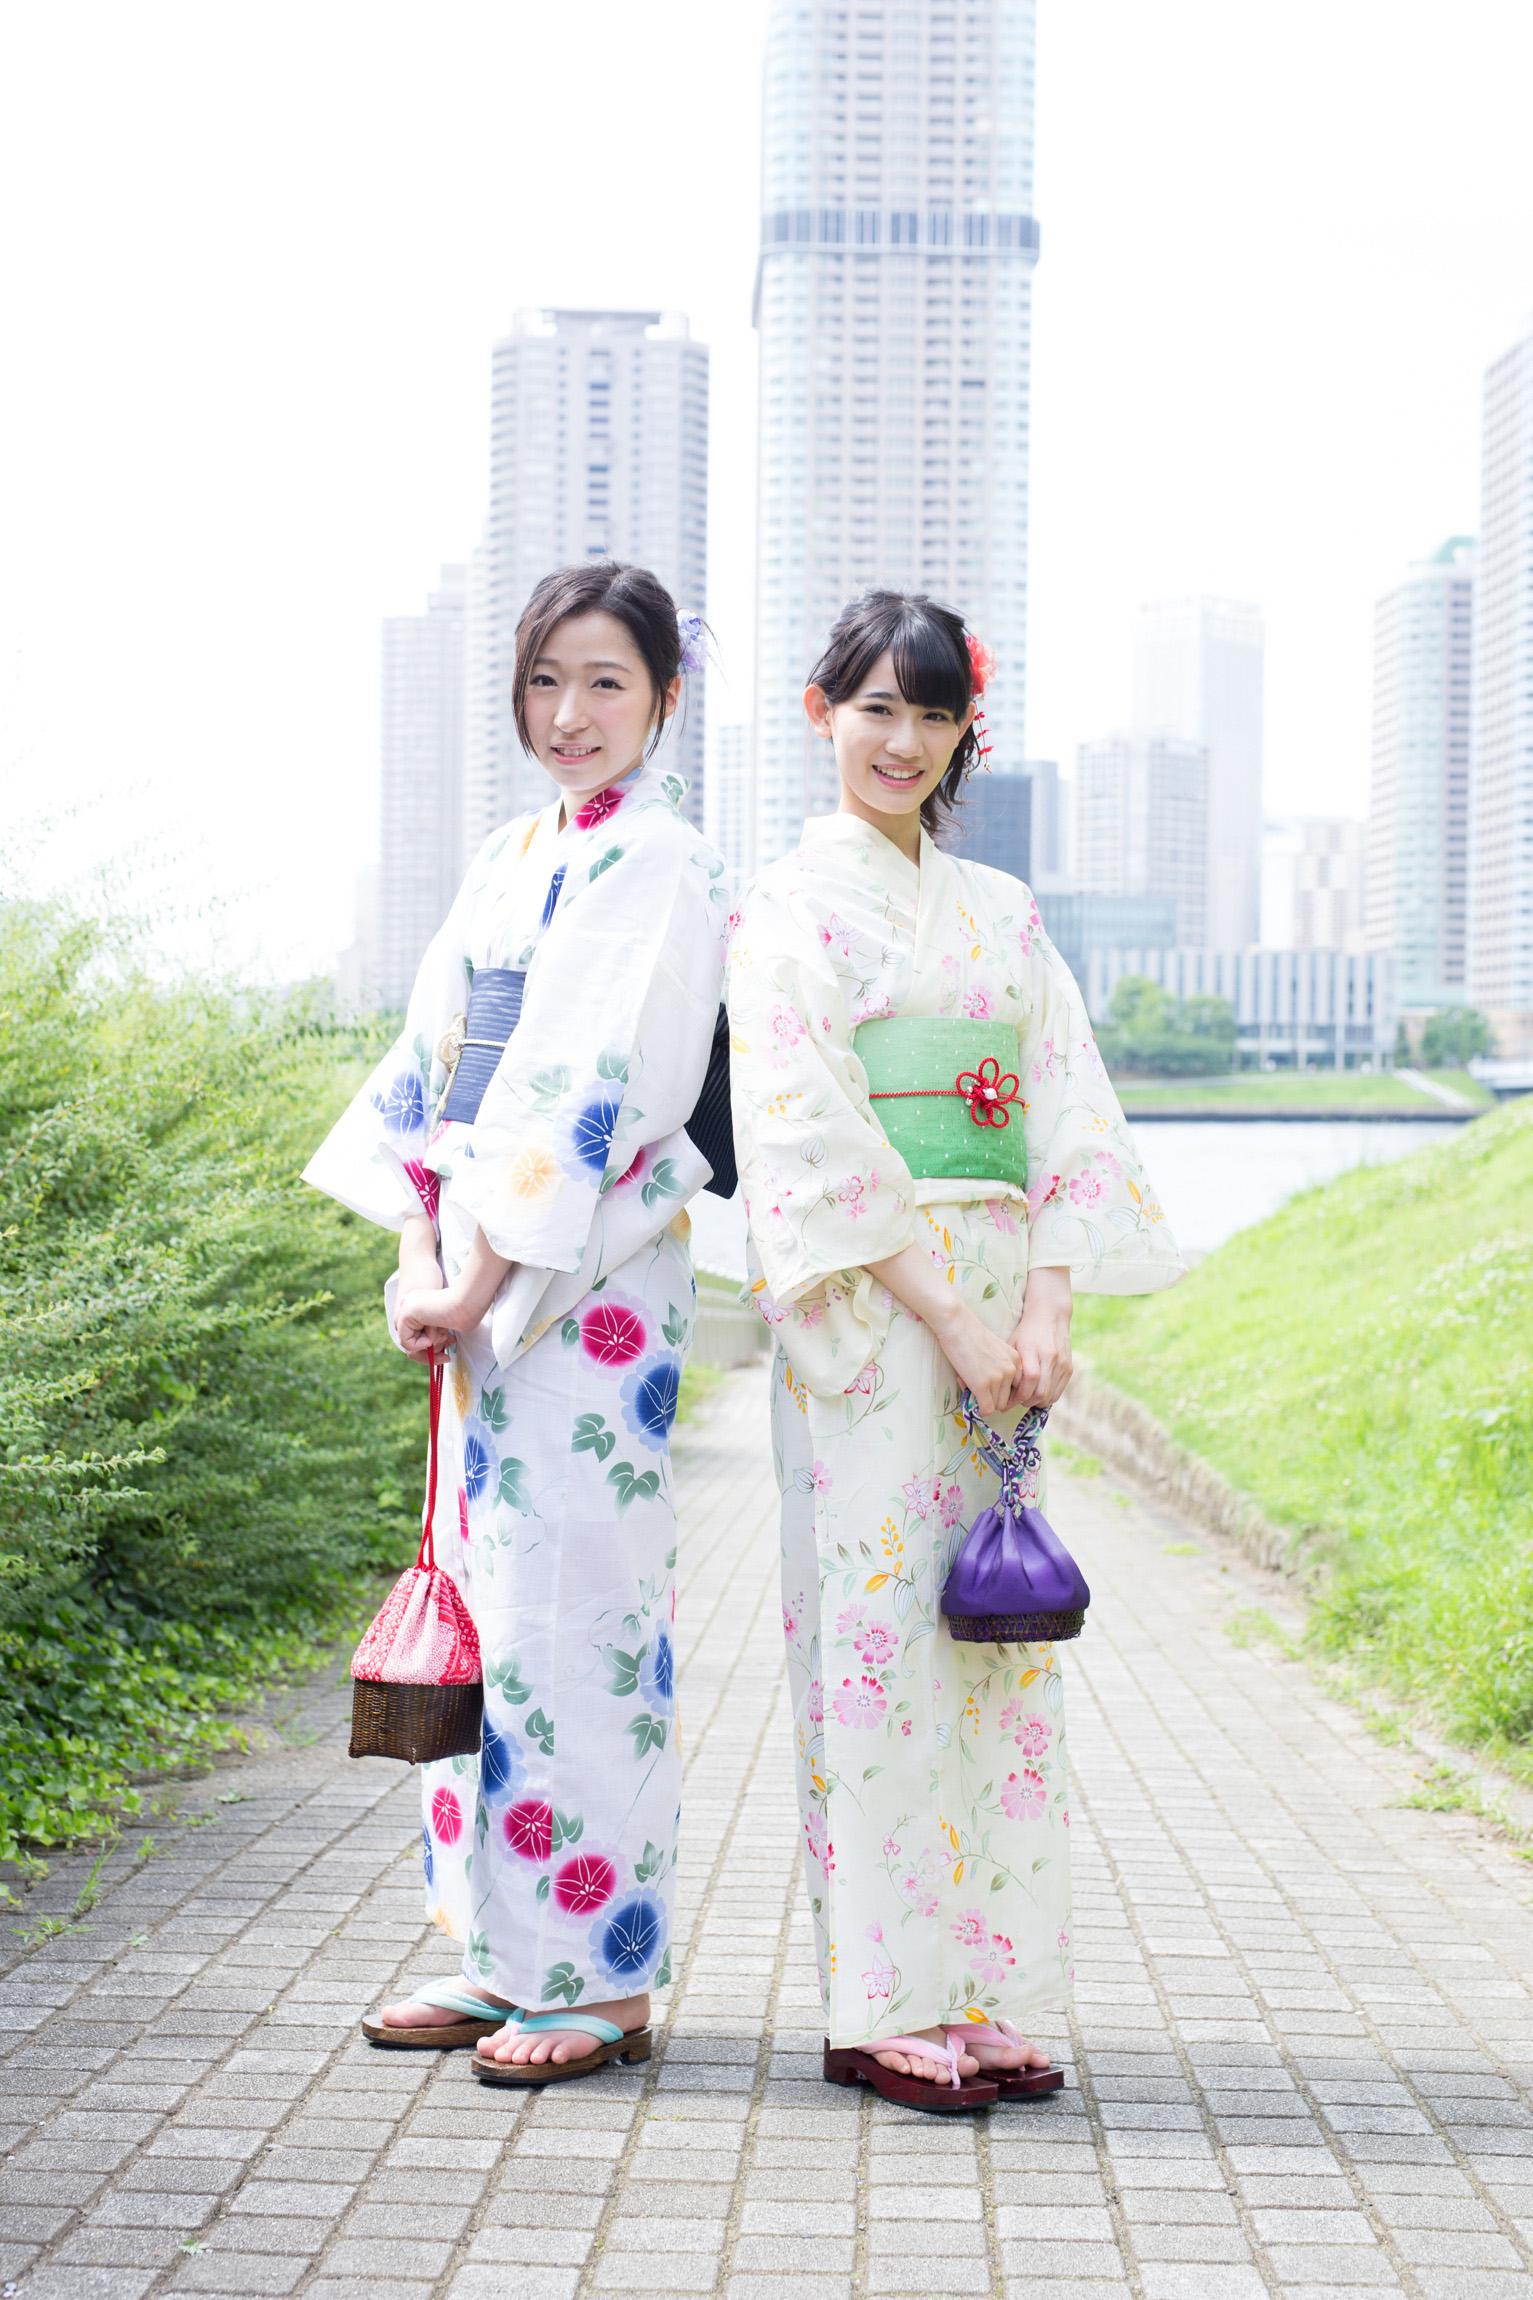 20160831_teamsyachihoko04_offshot_toukou